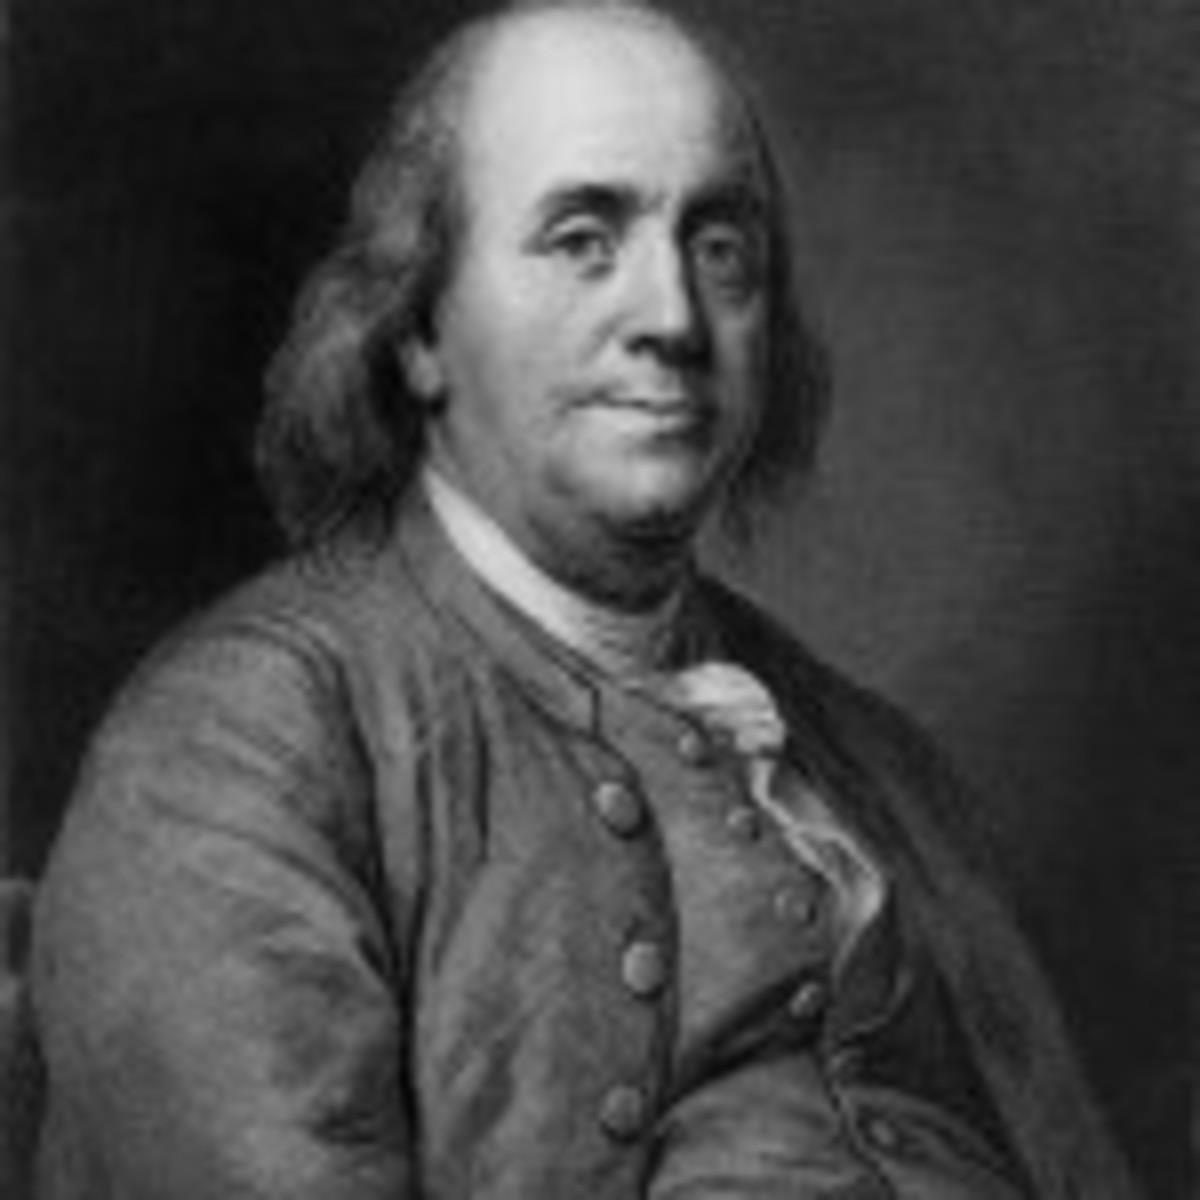 Benjamin Franklin had strong views on education.